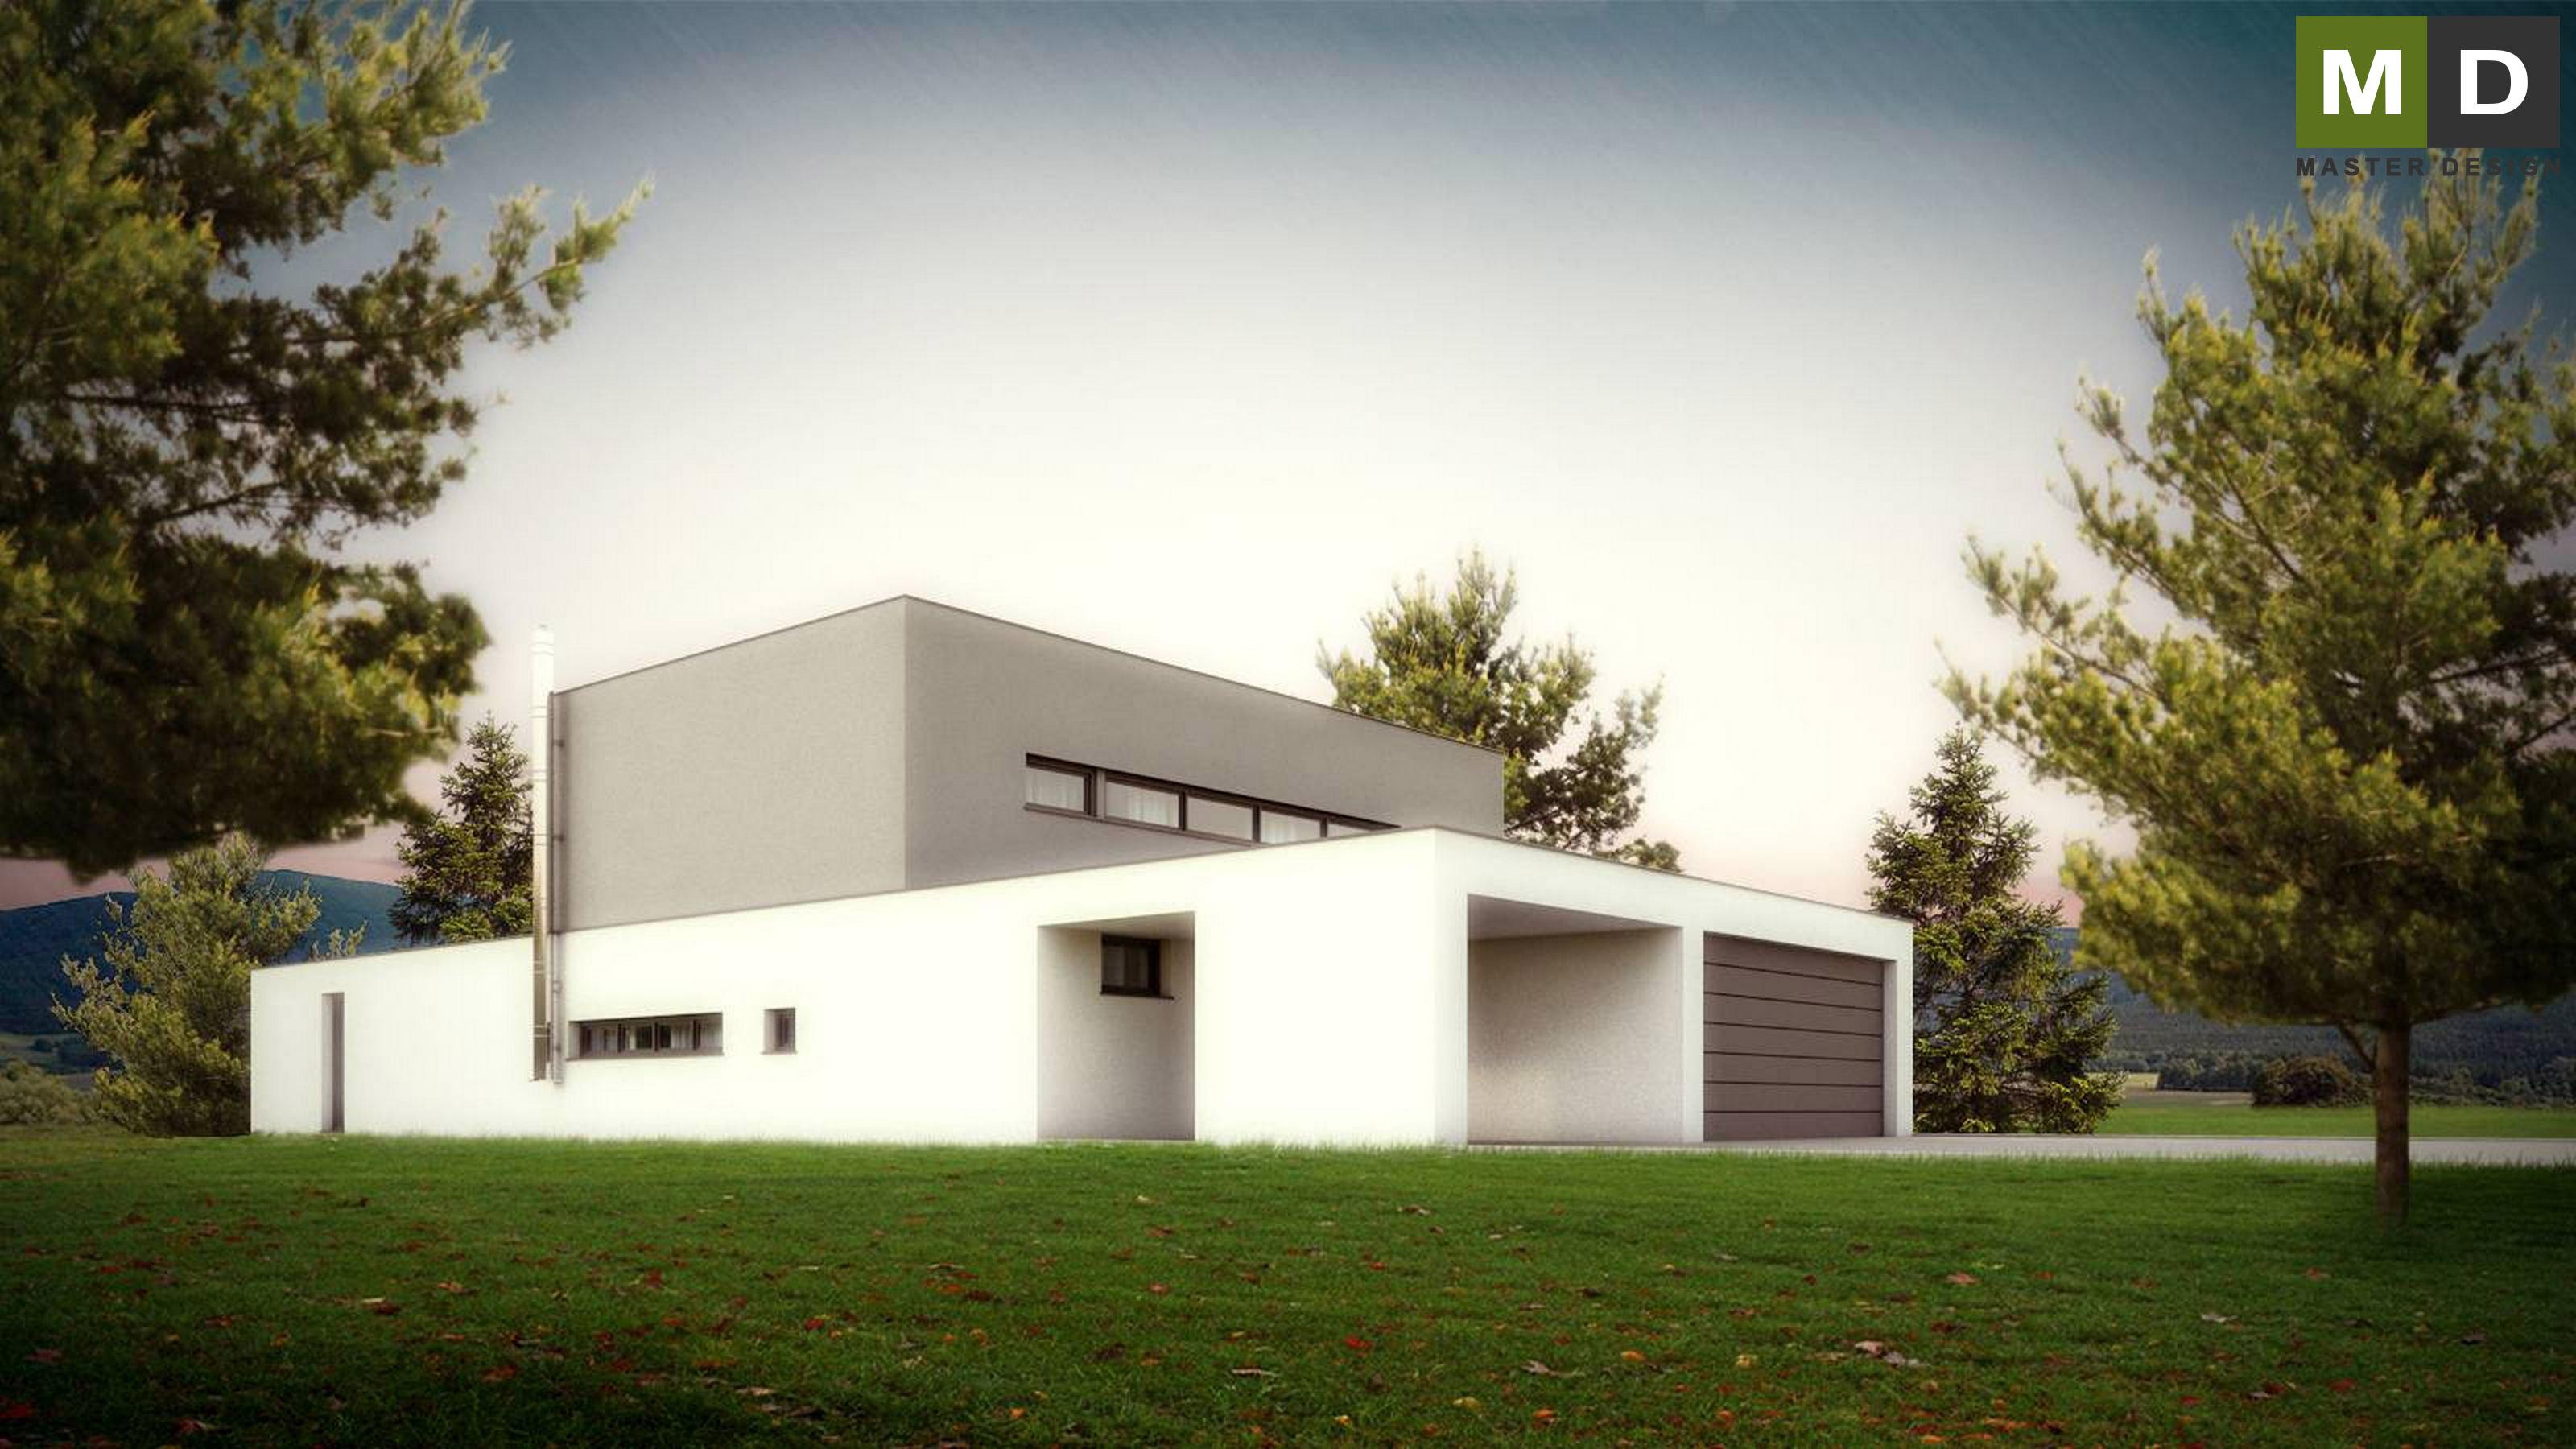 Nice Home Design Zlín Part - 5: ... Luxury Low-energy L-shaped House With A Green Roof - Zlín - Vizualizace  ...